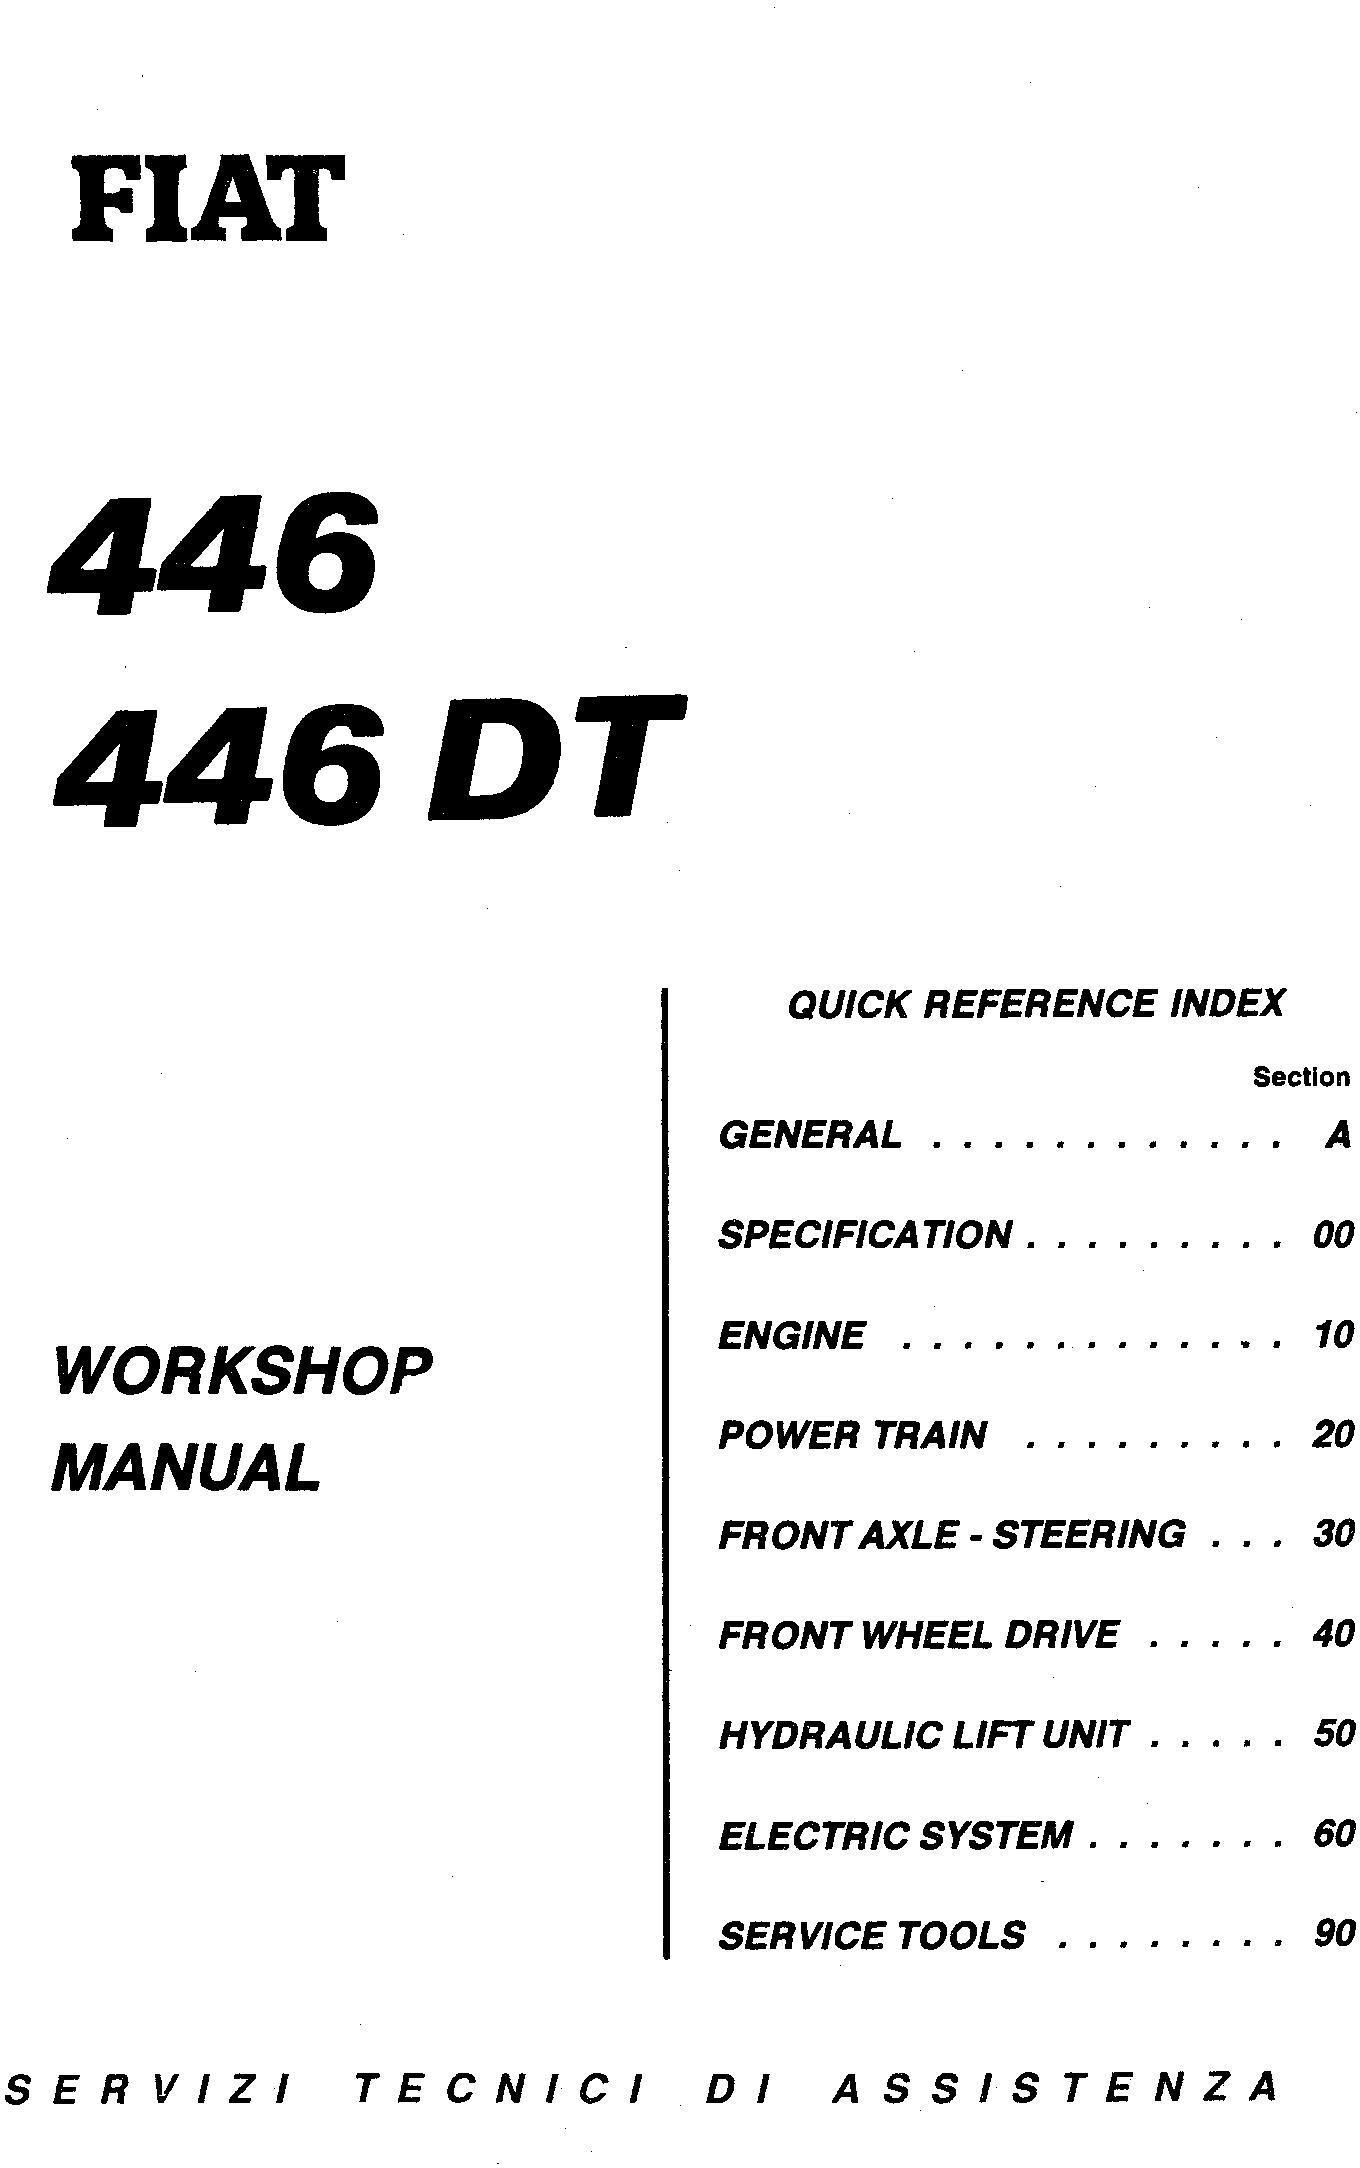 Fiat 446, 446DT, 55-56 (DT), 60-56 (DT), 65-56 (DT), 70-56